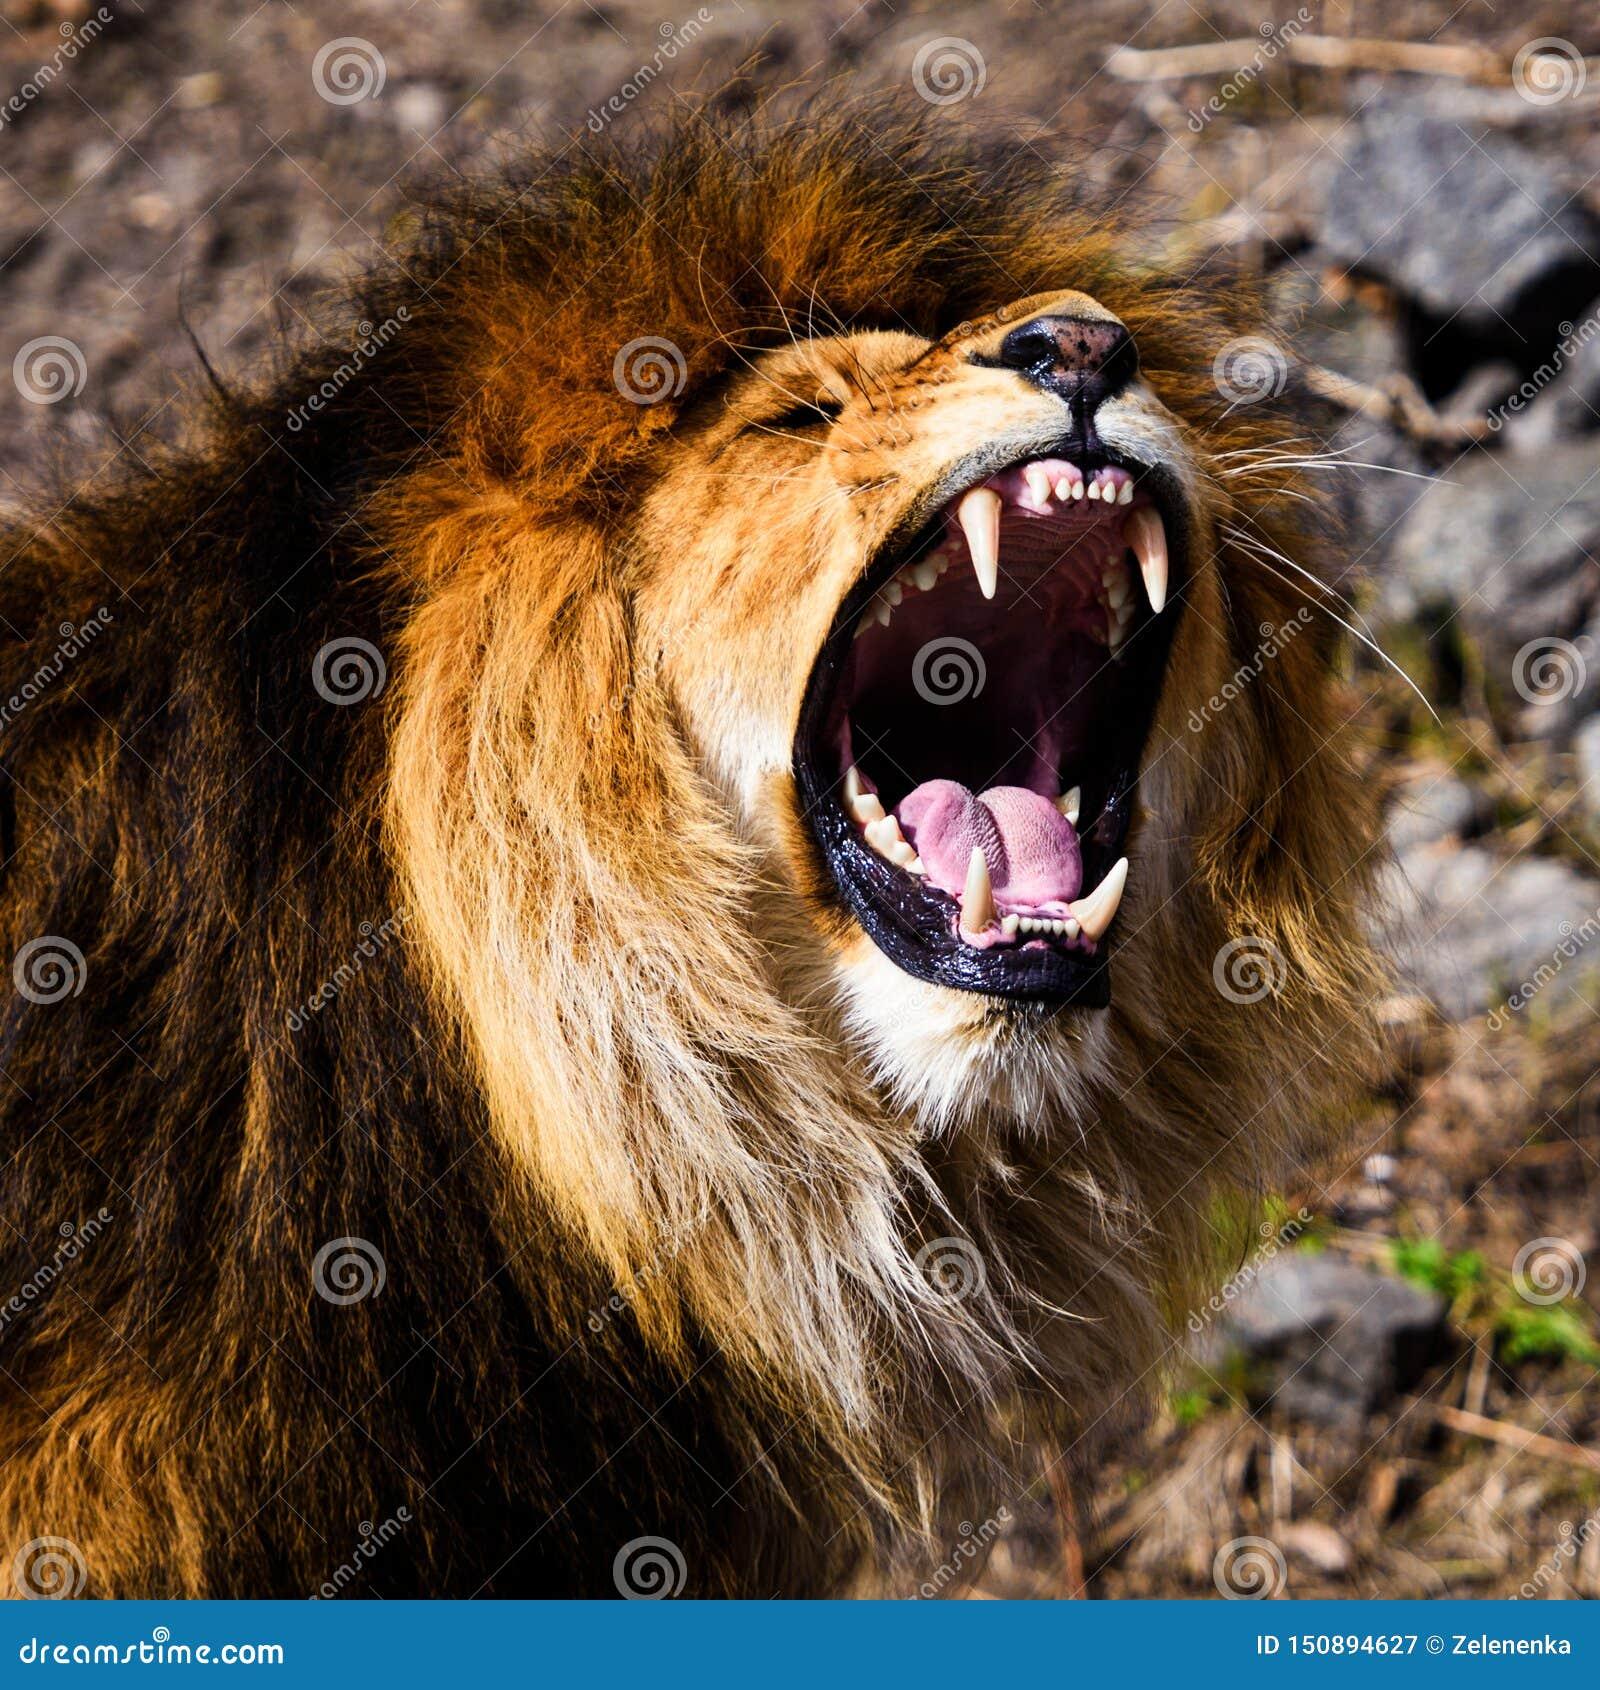 Leone vigoroso arrabbiato